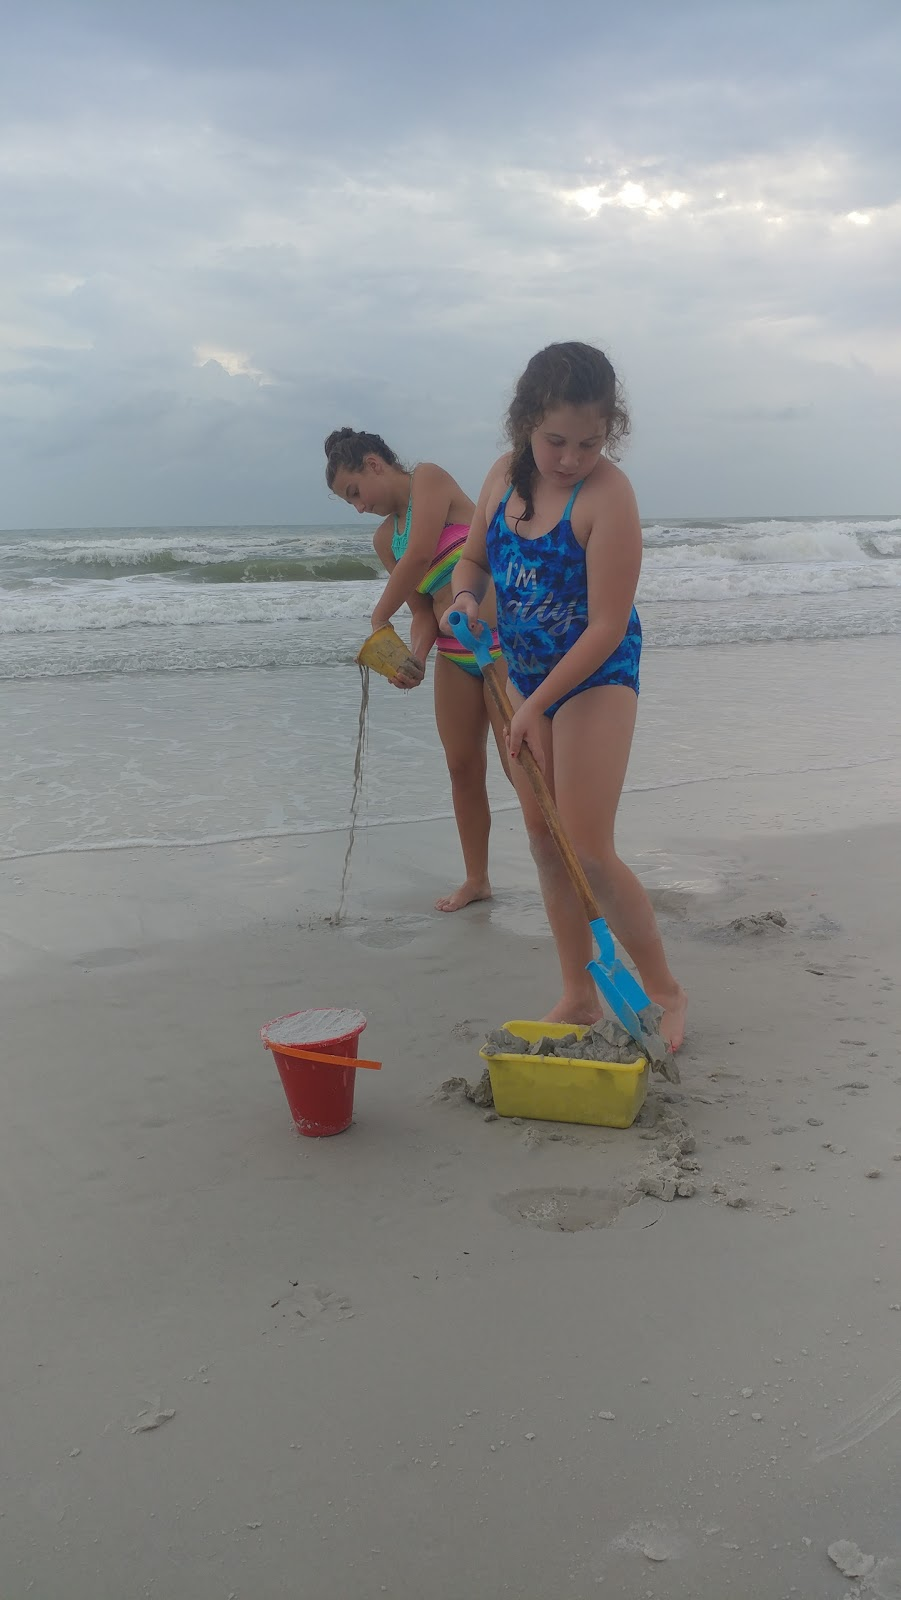 Barrett Beach Bungalows - real estate agency  | Photo 5 of 10 | Address: 19646 Gulf Blvd, Indian Shores, FL 33785, USA | Phone: (727) 455-2832